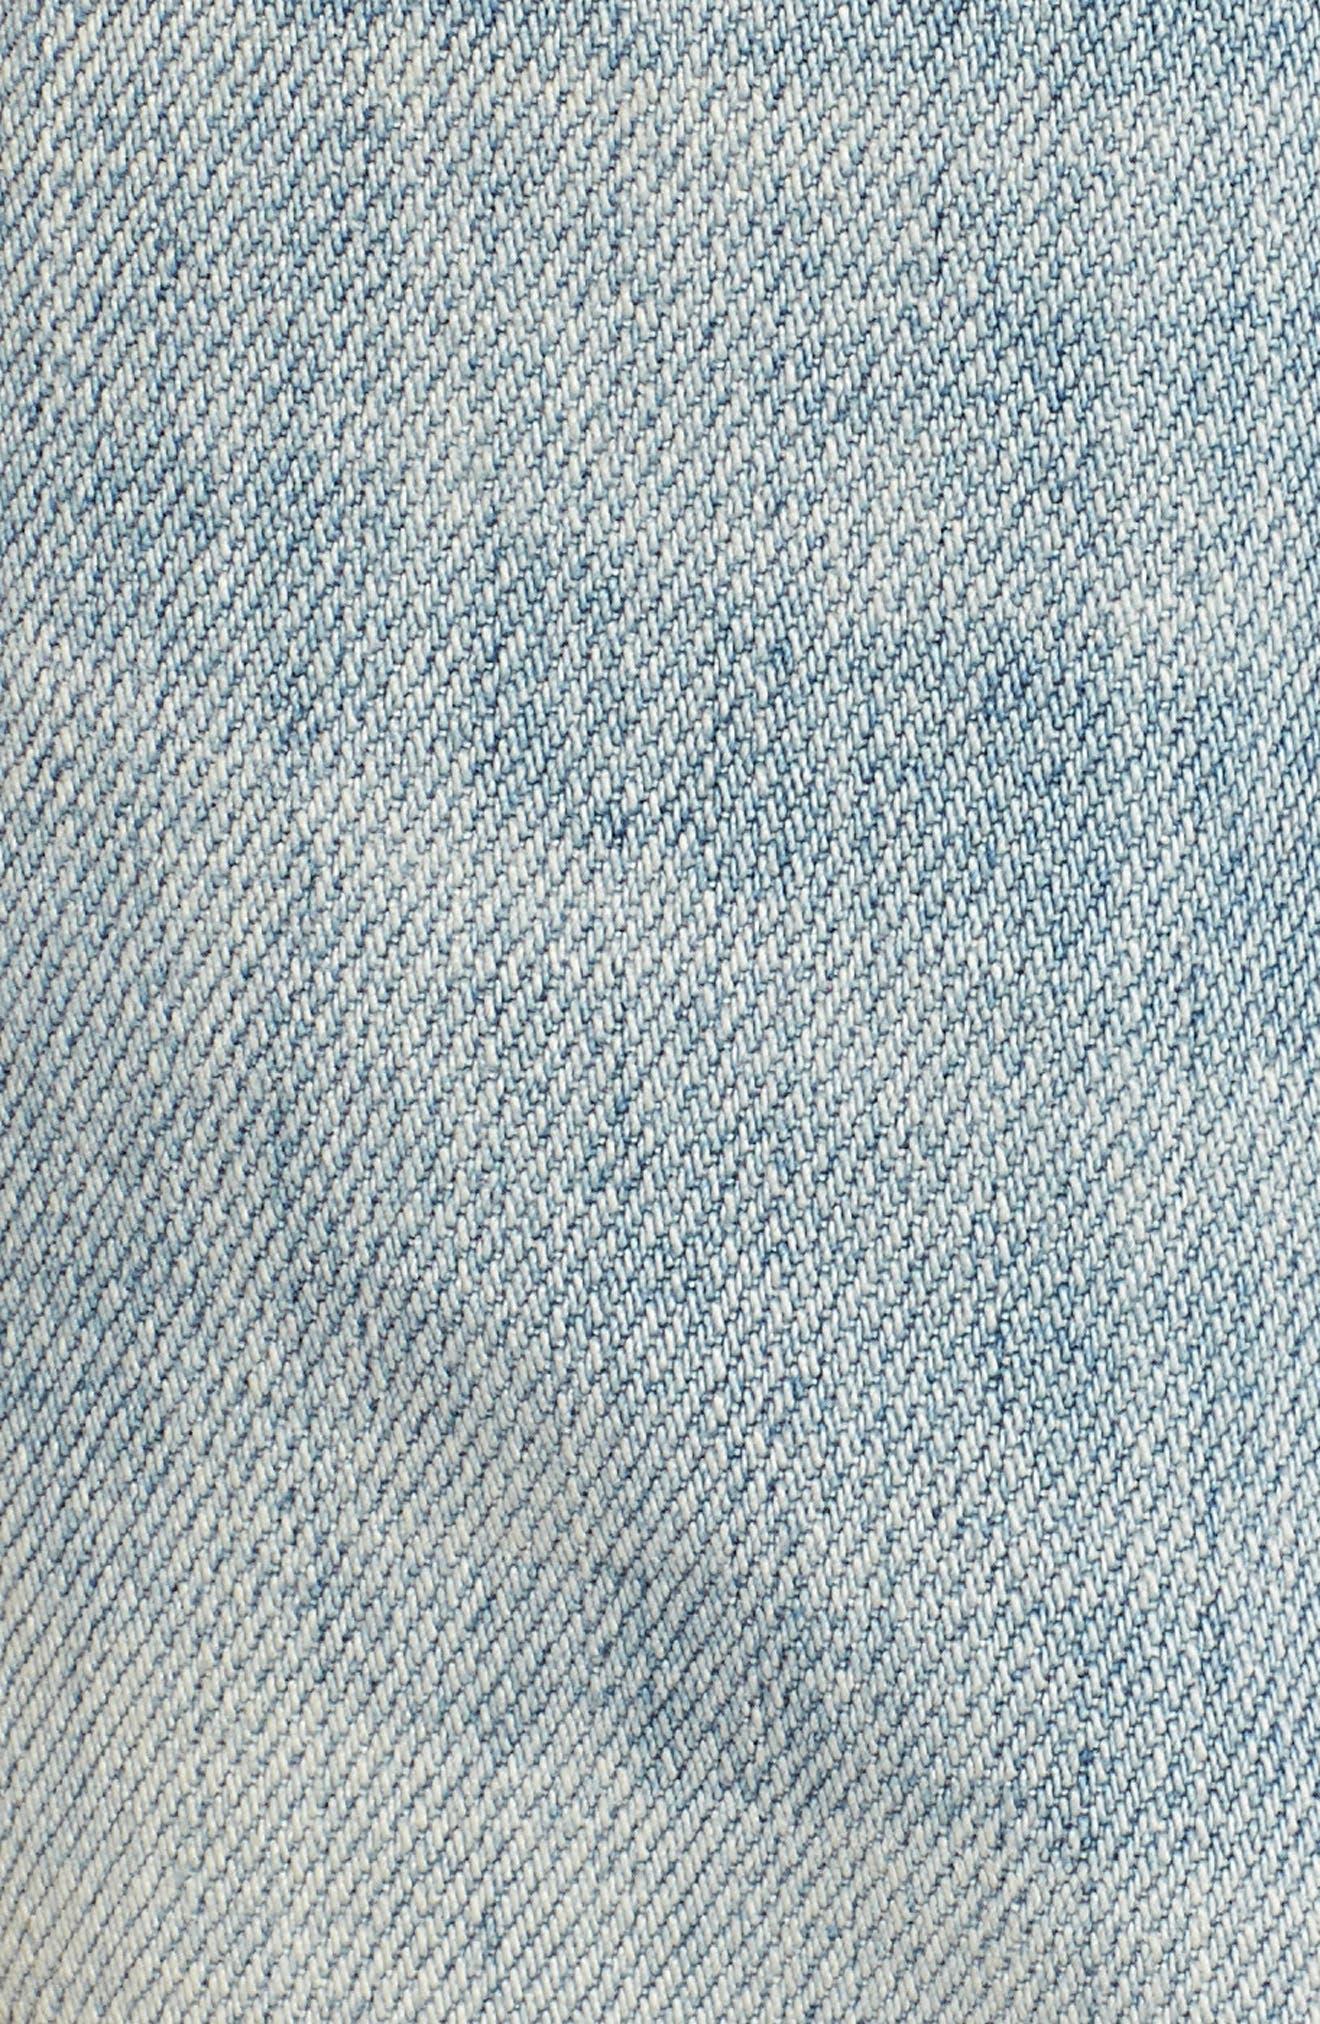 Embroidered Boyfriend Denim Shorts,                             Alternate thumbnail 5, color,                             420